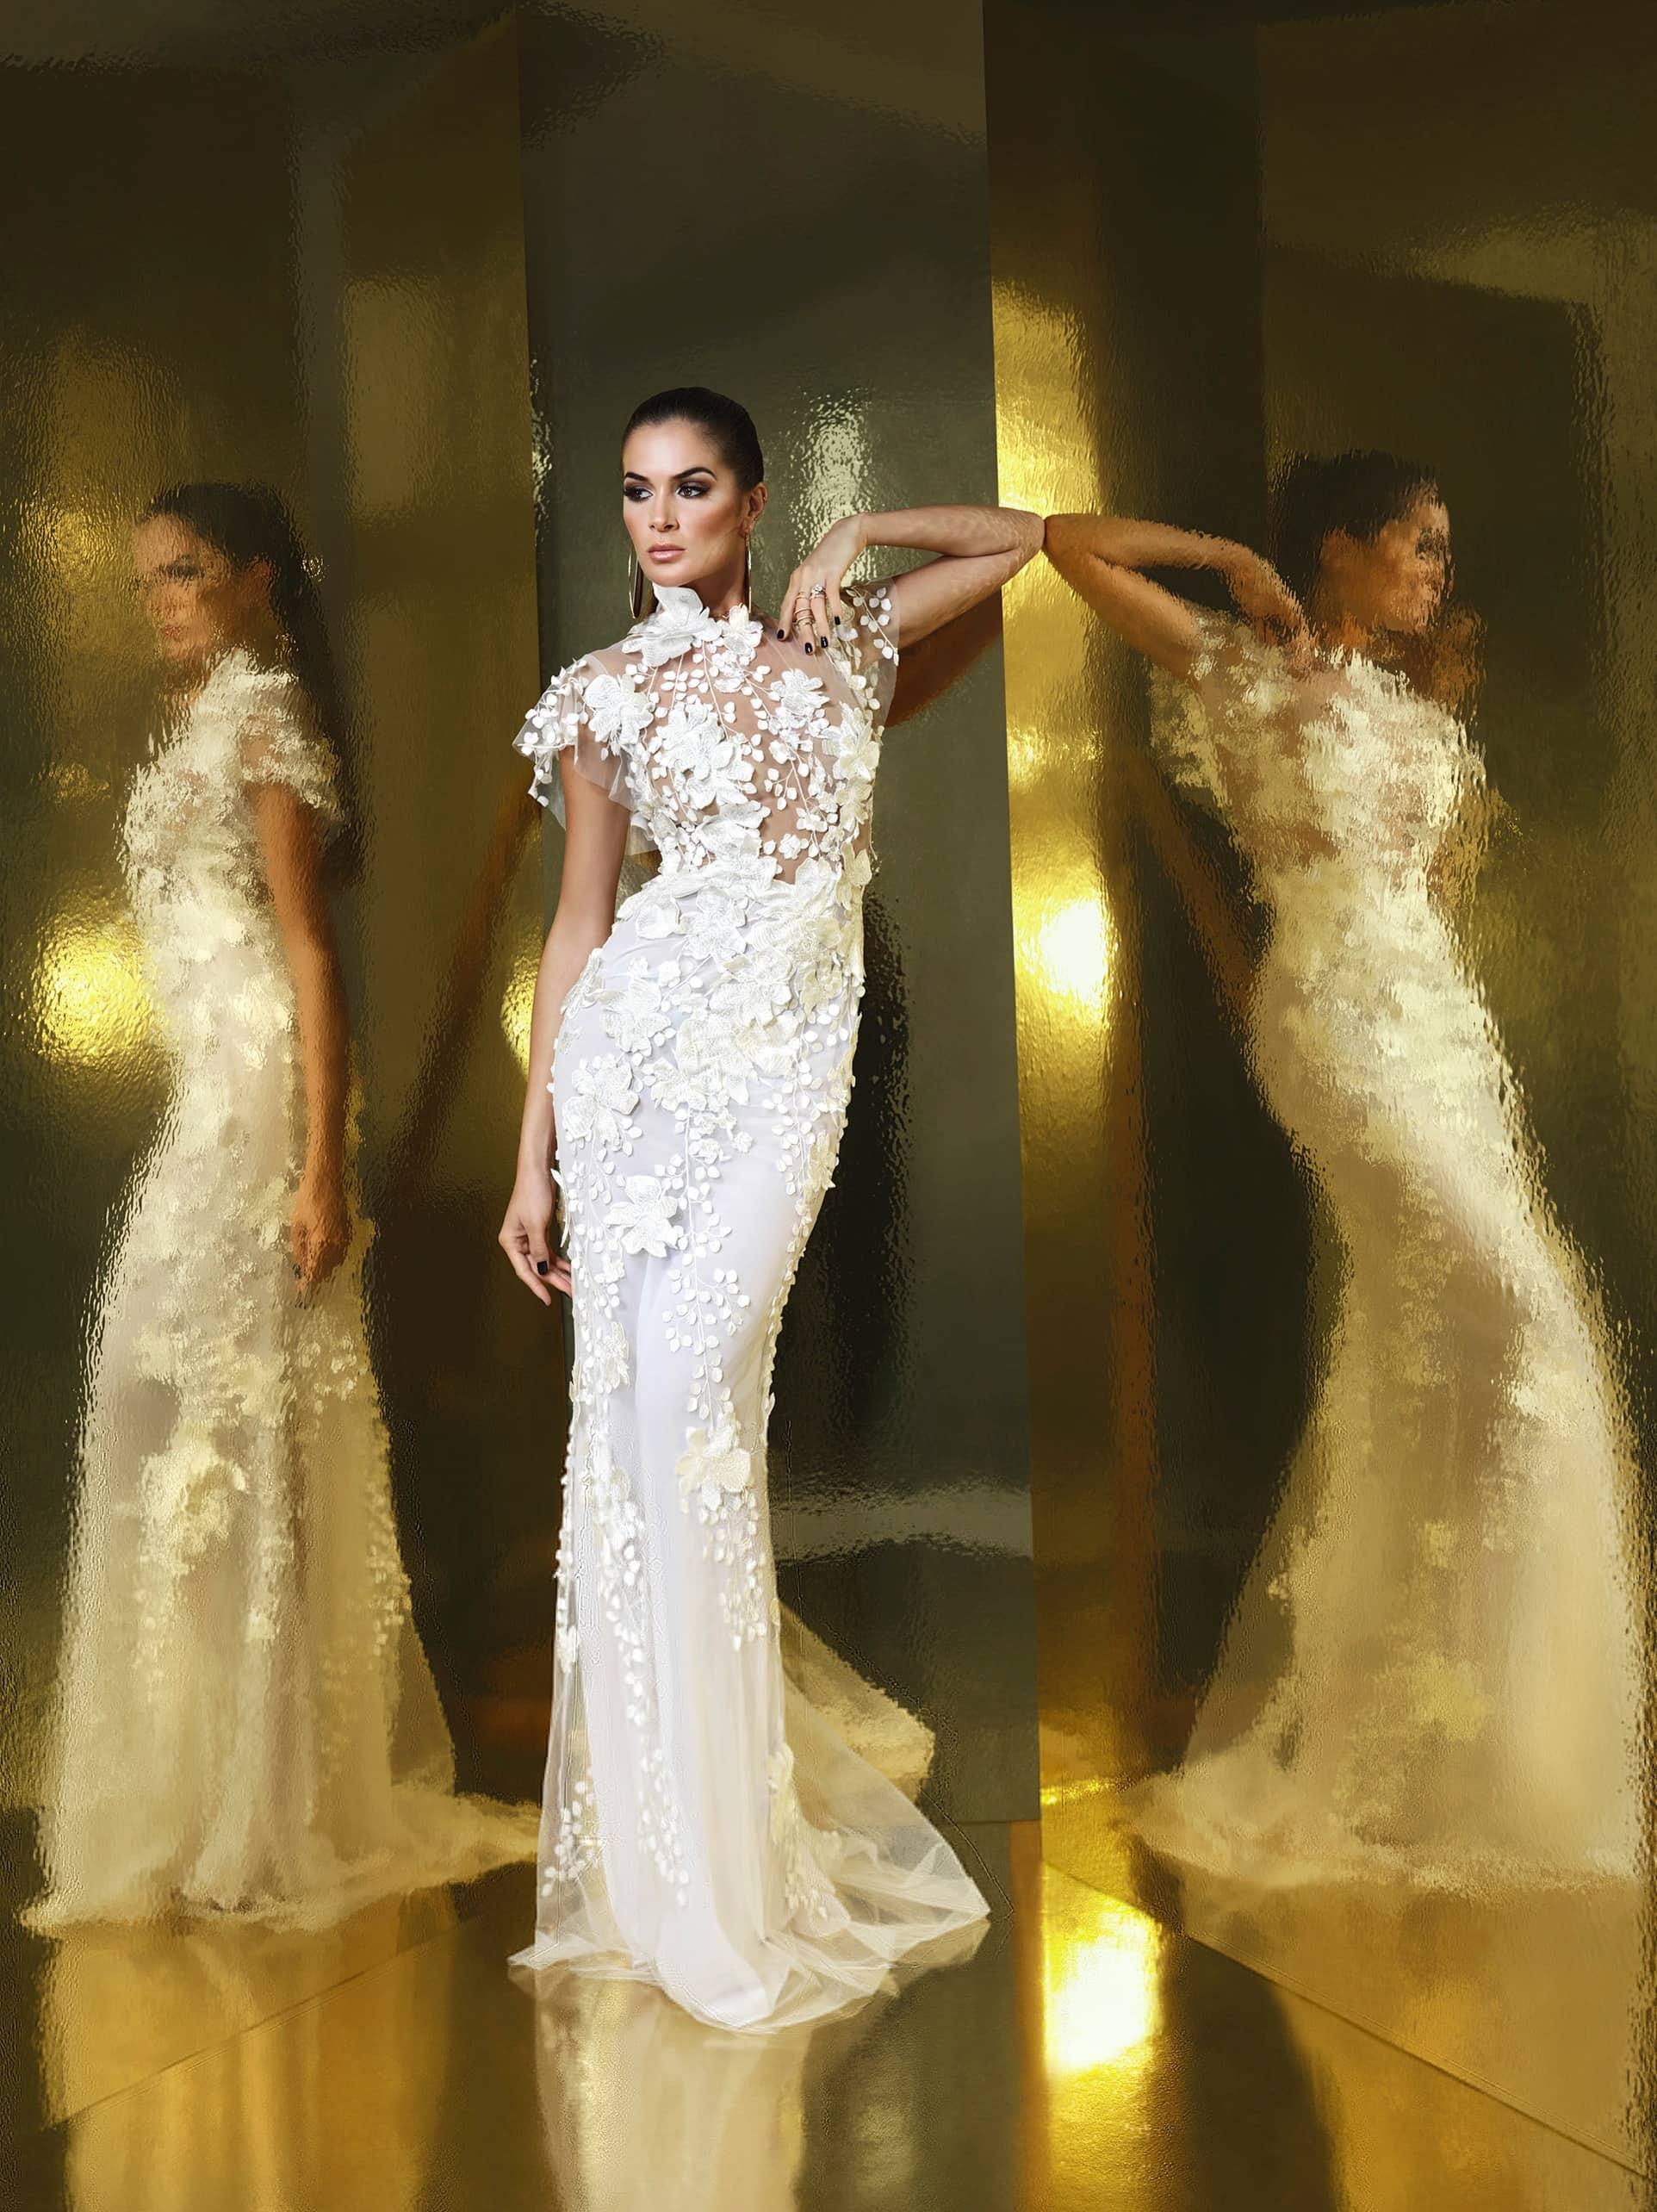 88a79abb9aa Thibaut Lauvergne wedding dresses in Paris - Metal Flaque Bridal Shop